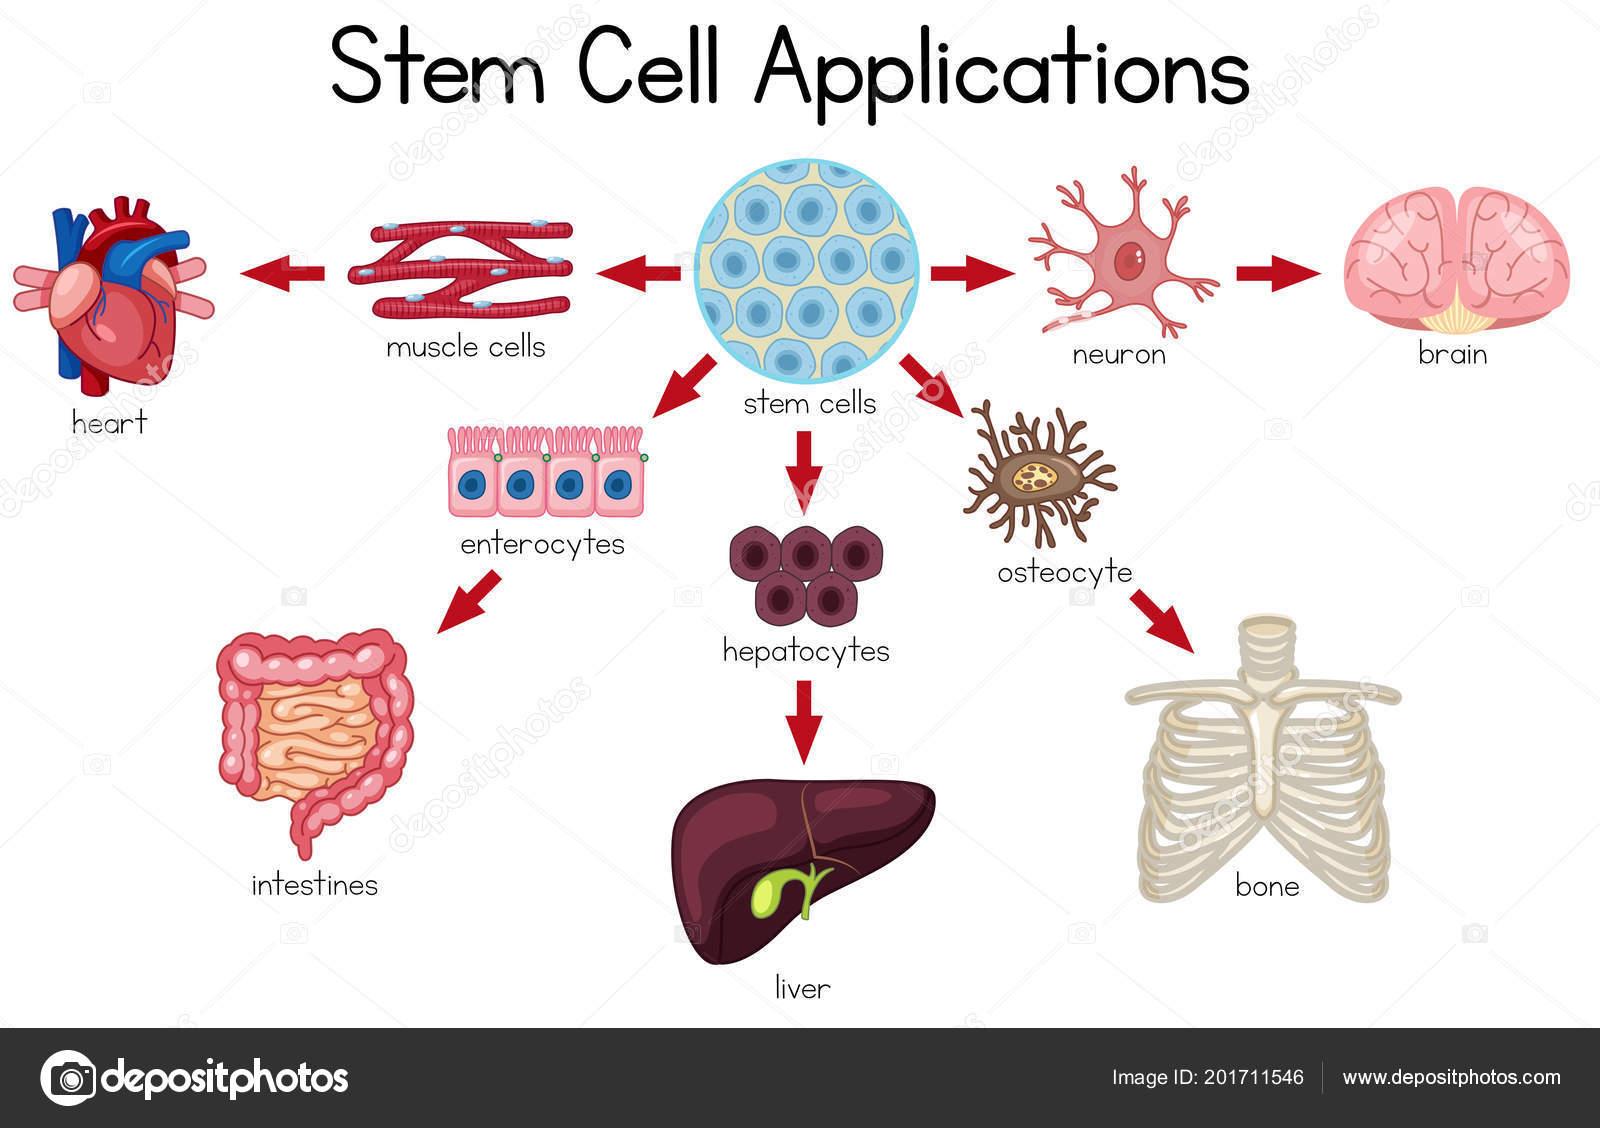 Stem cell applications diagram illustration vetores de stock stem cell applications diagram illustration vetores de stock ccuart Images